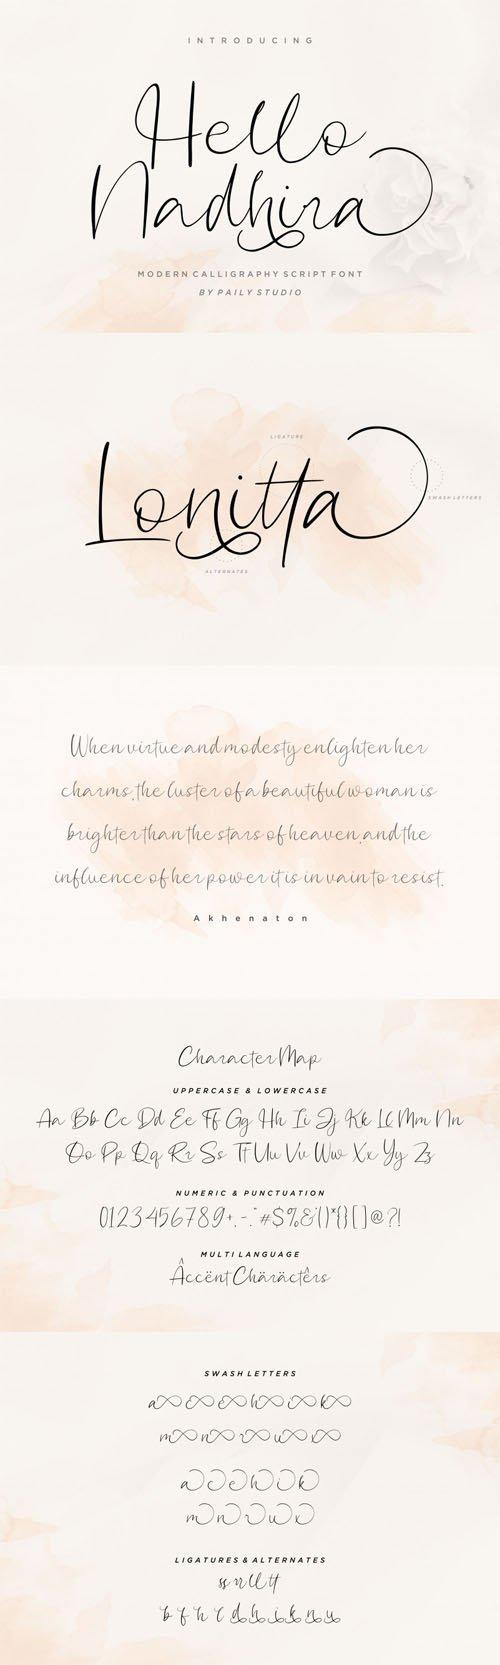 Hello Nadhira - Modern Calligraphy Script Font